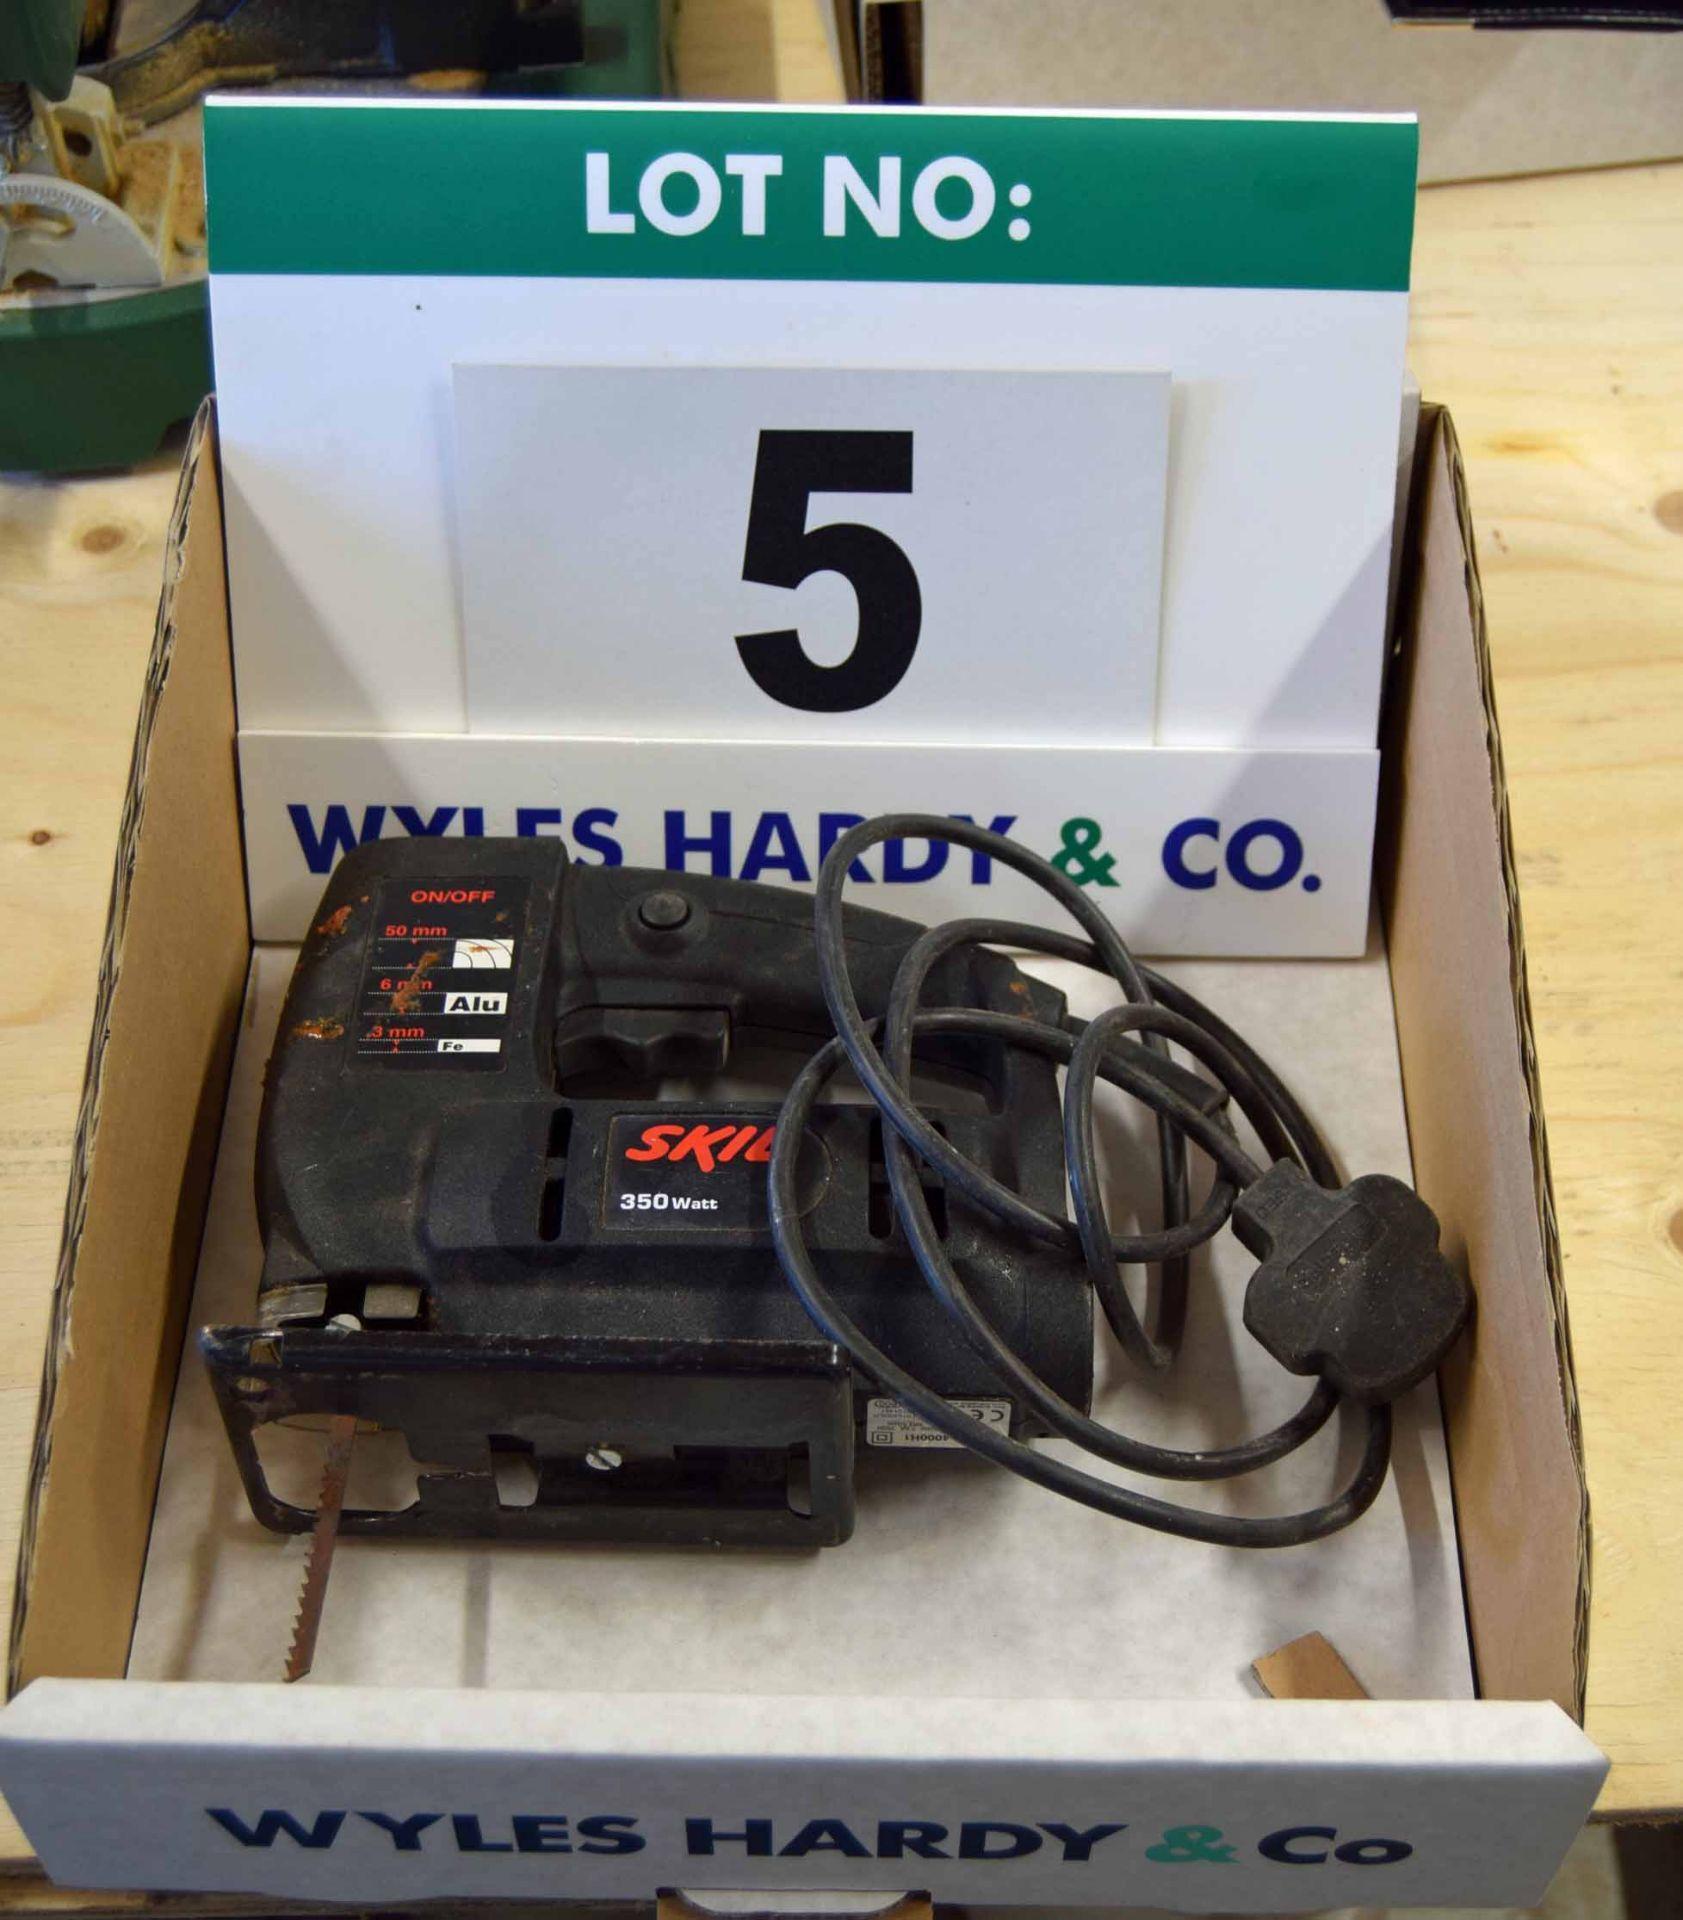 Lot 5 - A SKILL 4000HI 240V AC Electric Jigsaw